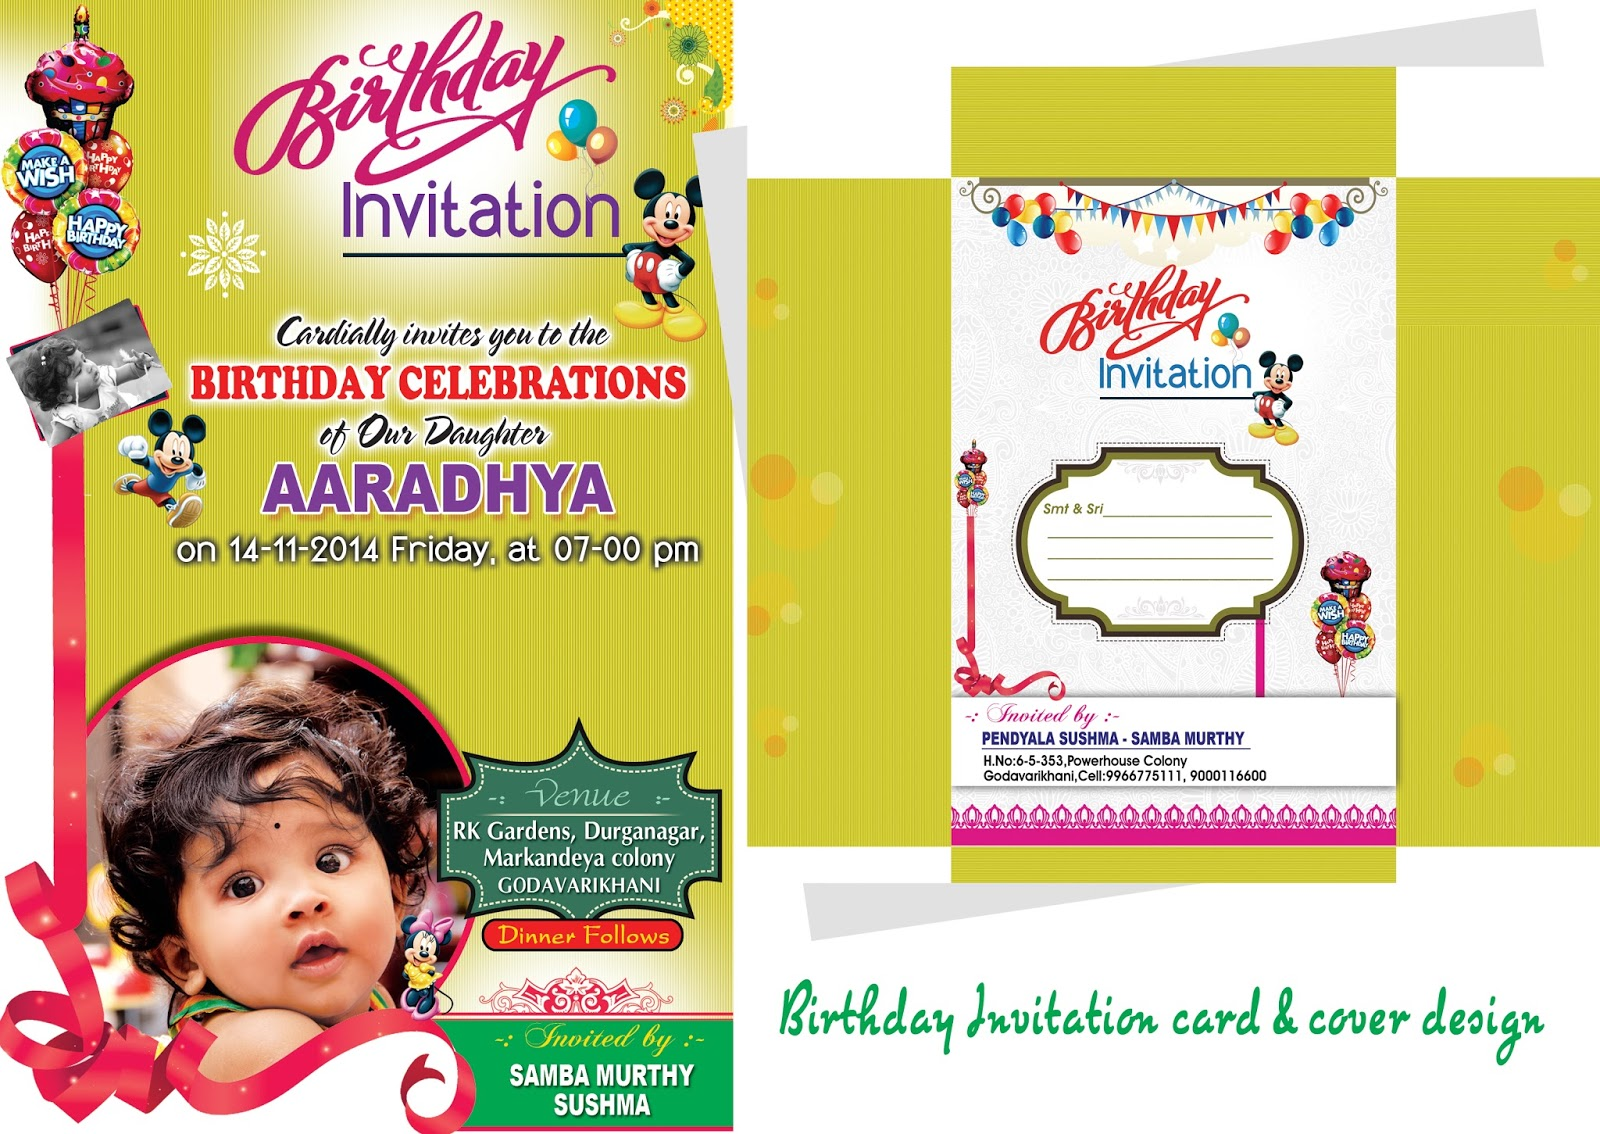 Birthday Invitation Card Design Psd Template Free Downloads Naveengfx